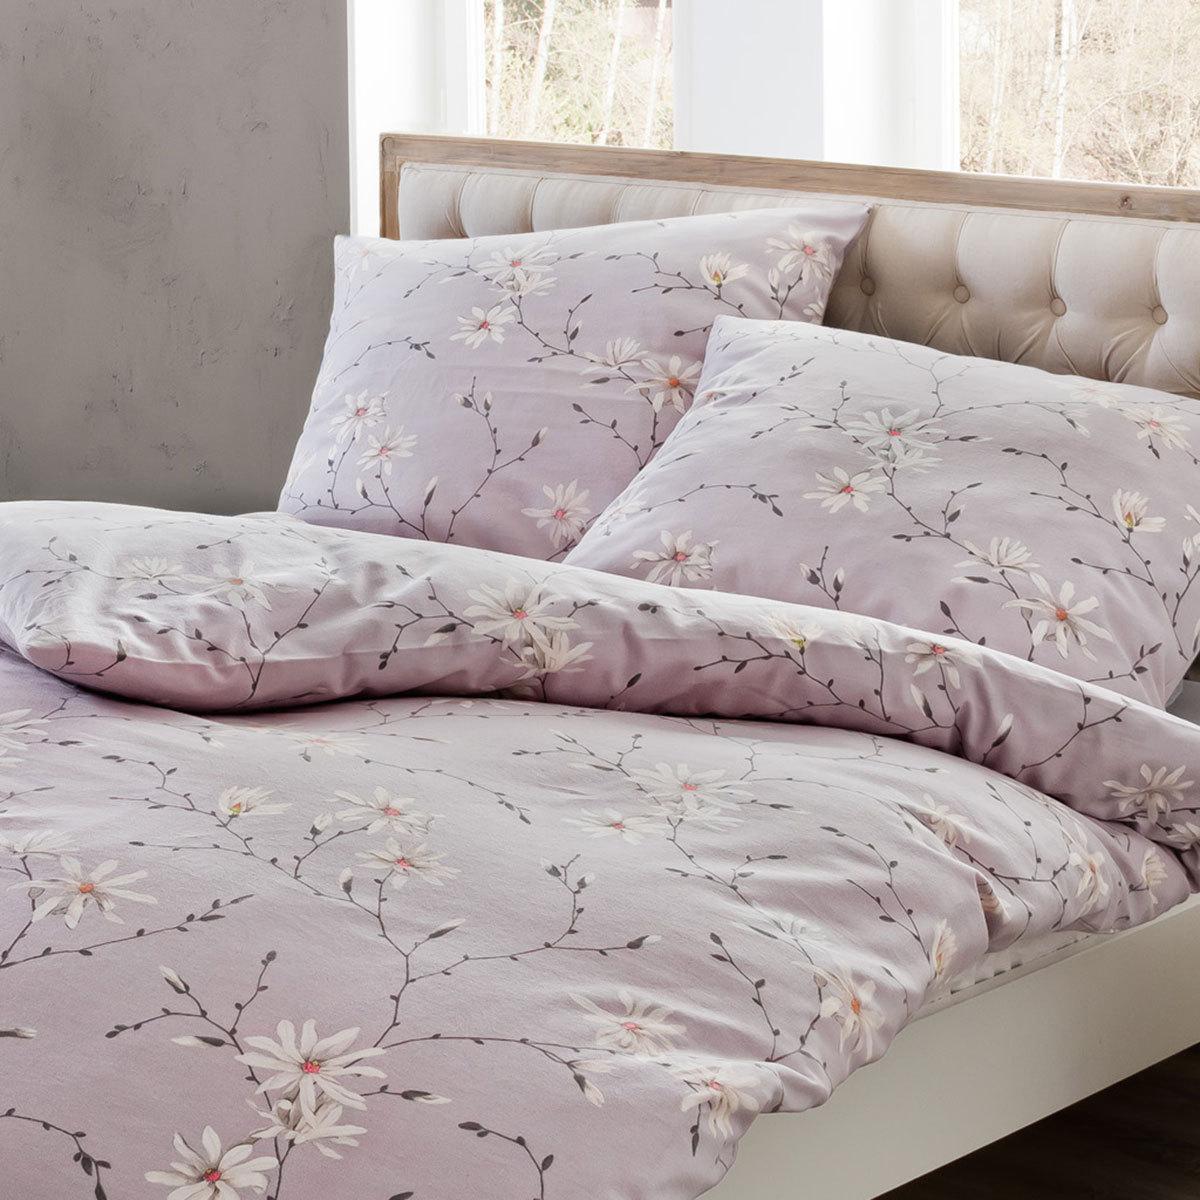 estella feinflanell bettw sche zams mauve g nstig online kaufen bei bettwaren shop. Black Bedroom Furniture Sets. Home Design Ideas